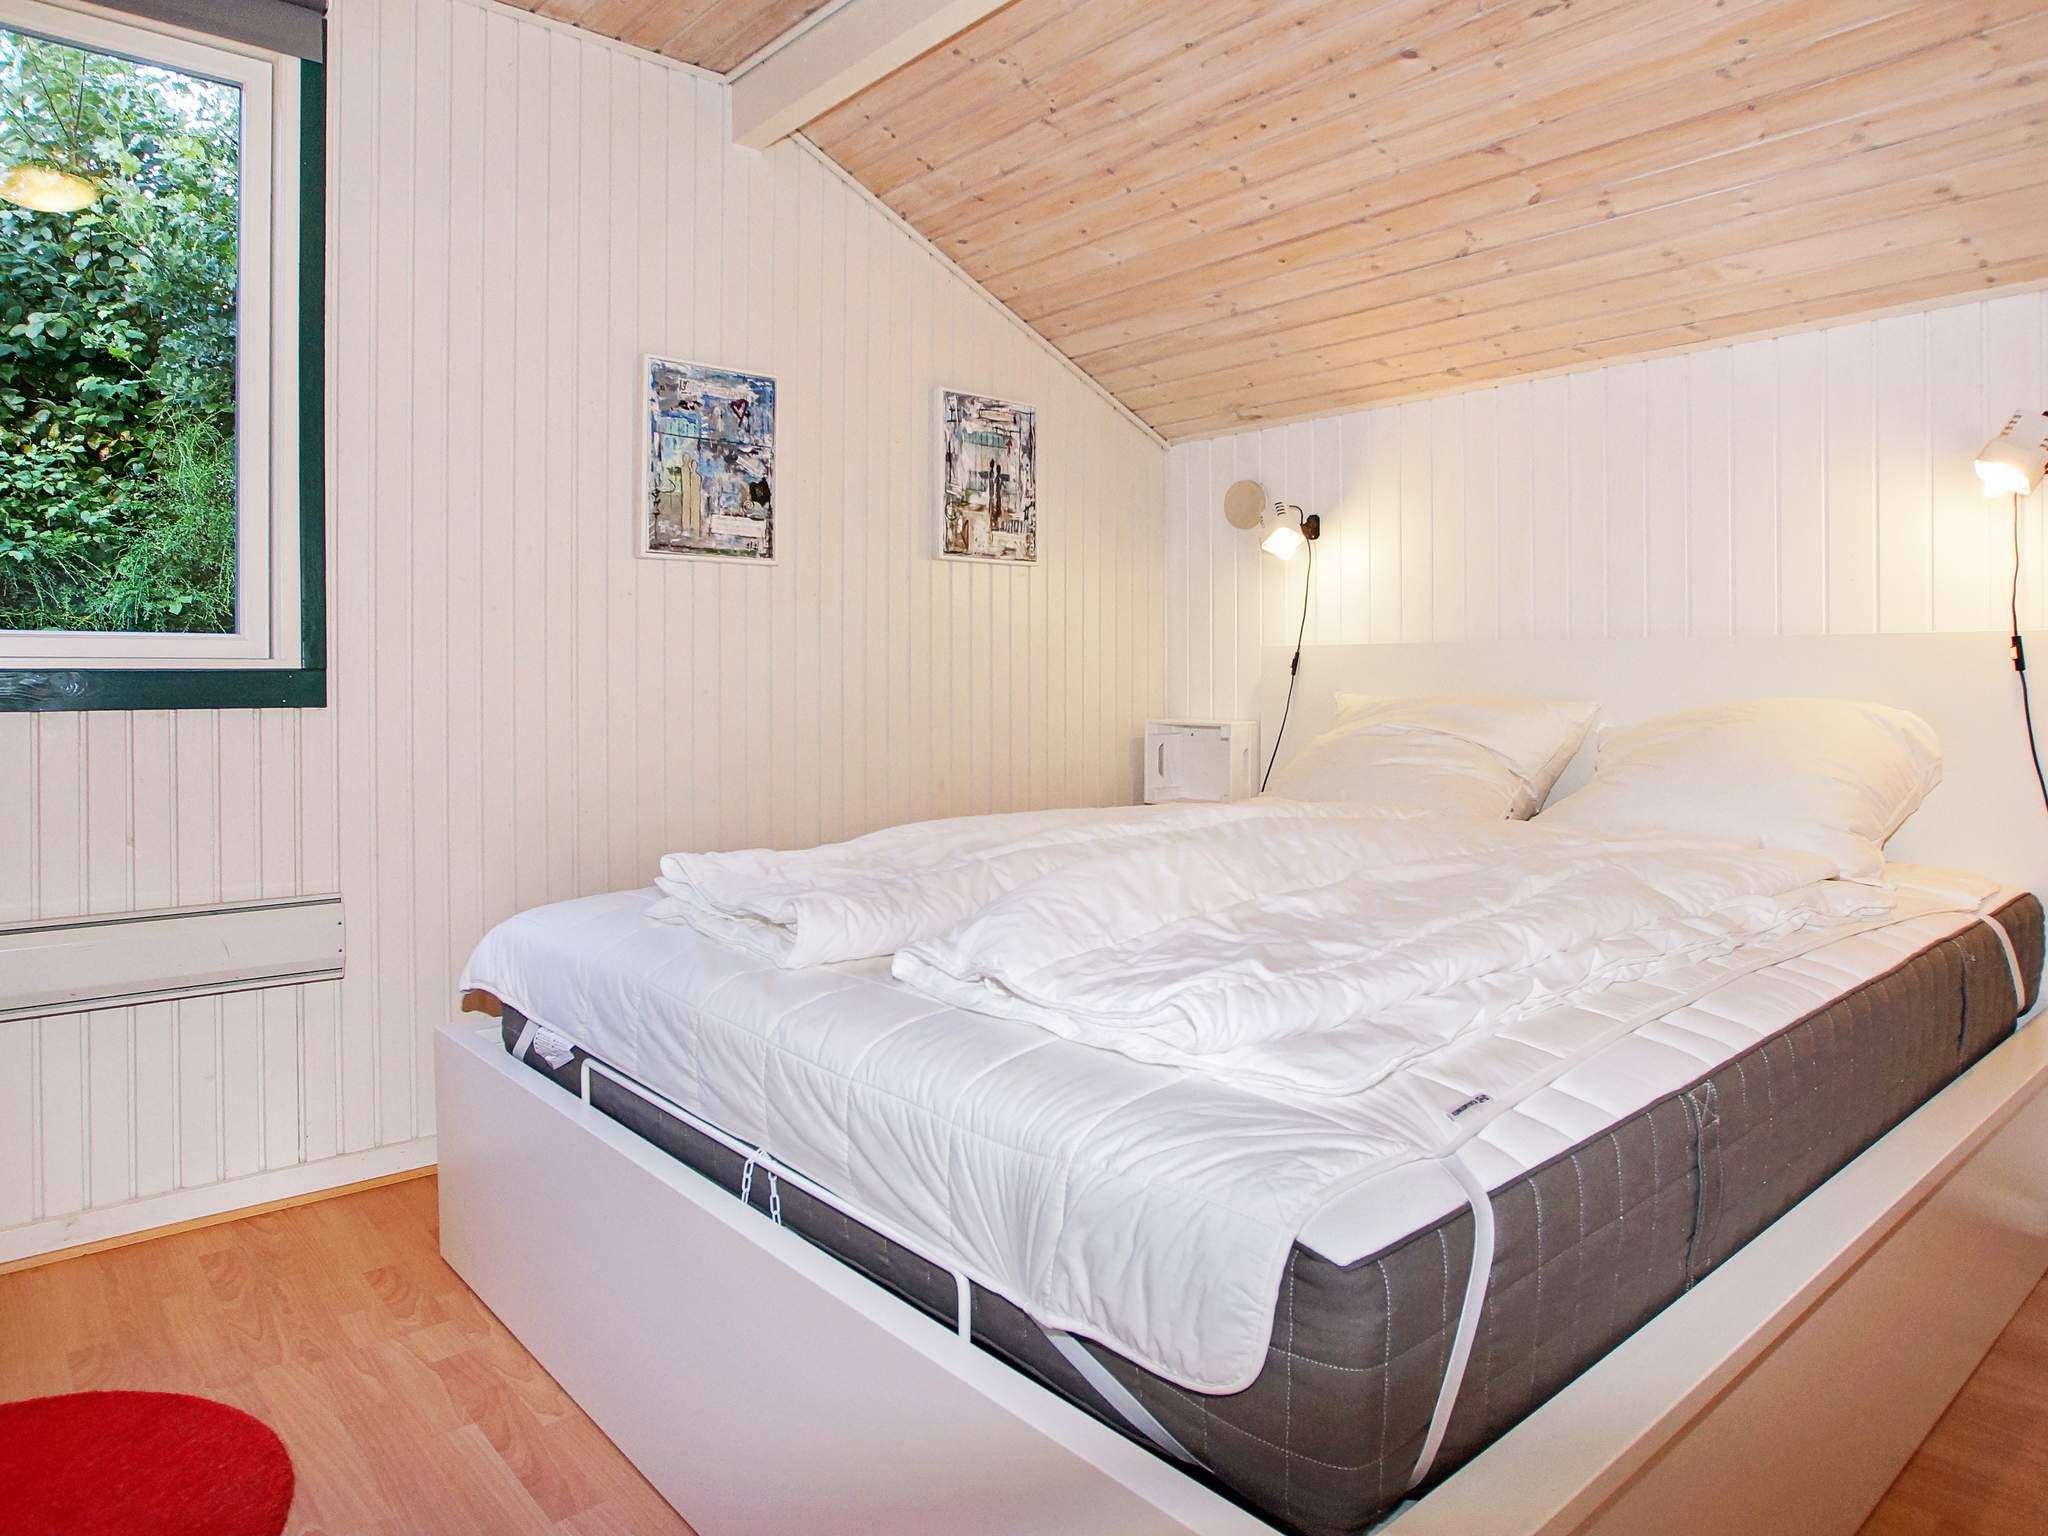 Ferienhaus Skaven Strand (493385), Tarm, , Westjütland, Dänemark, Bild 16